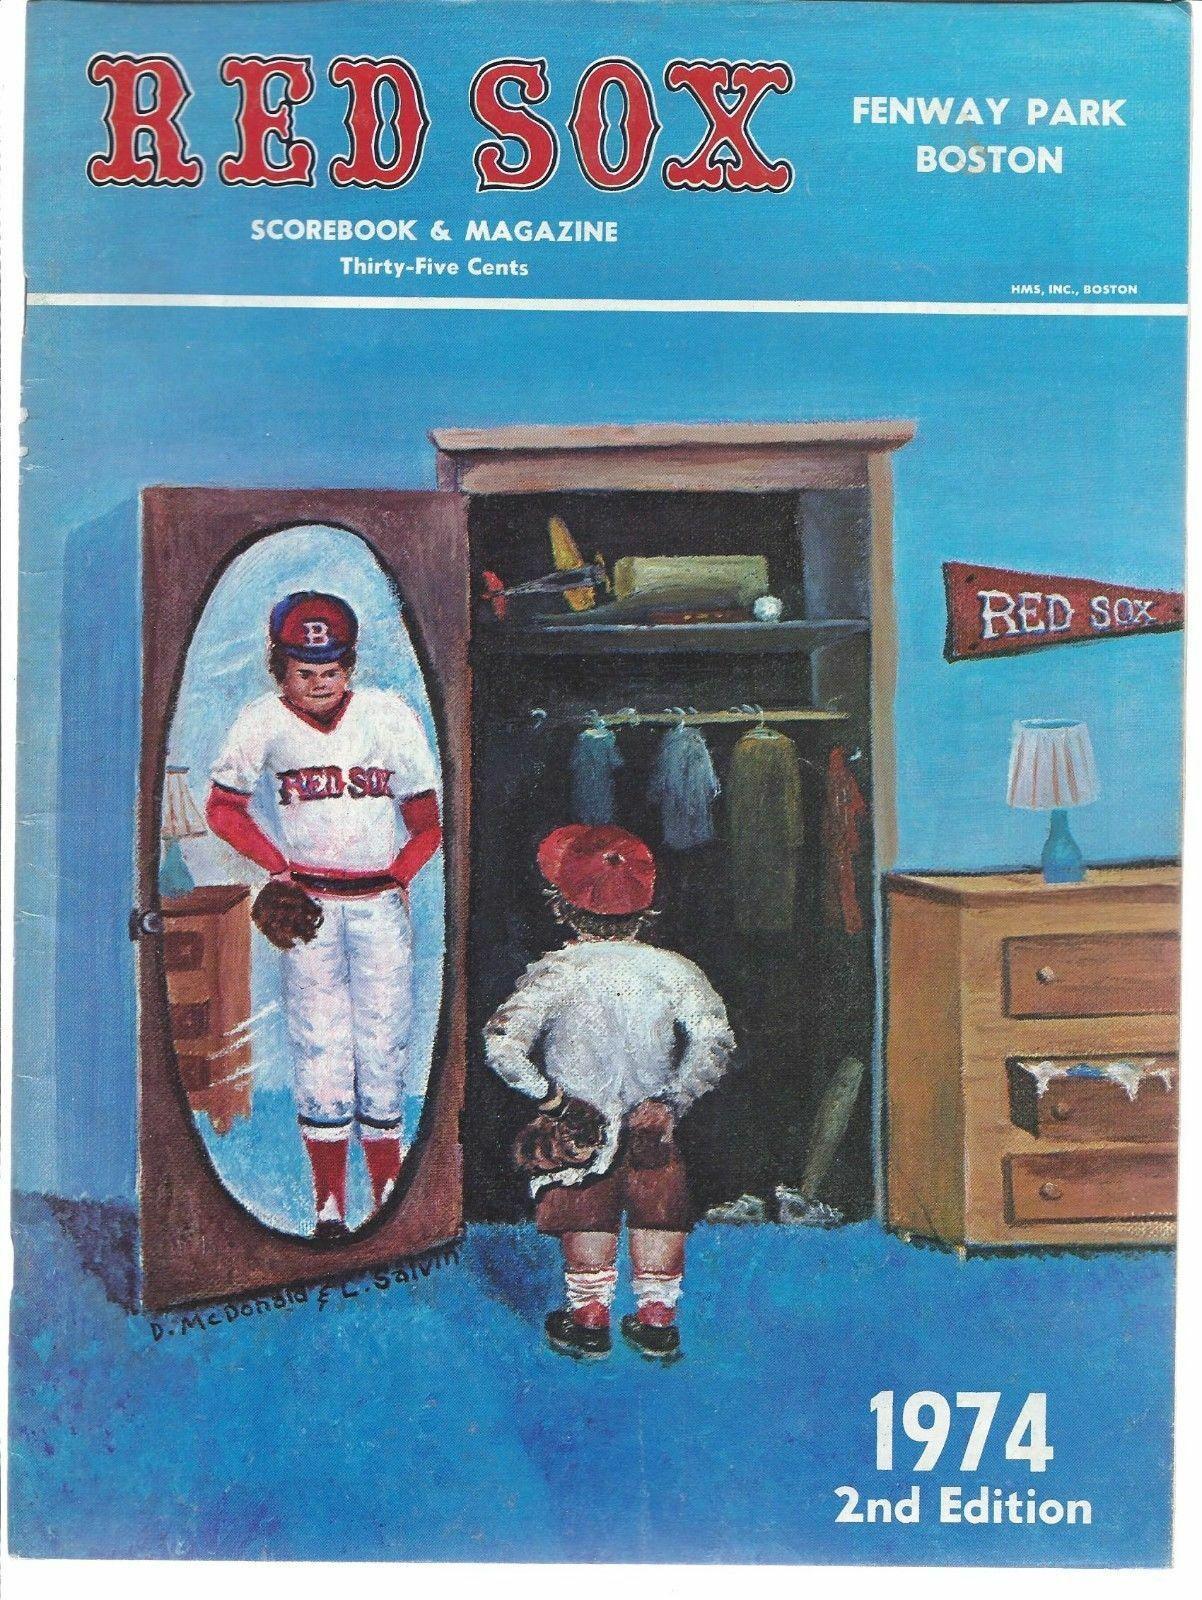 1974 Boston Red Sox Fenway Park Official Scorebook Magazine MLB Baseball